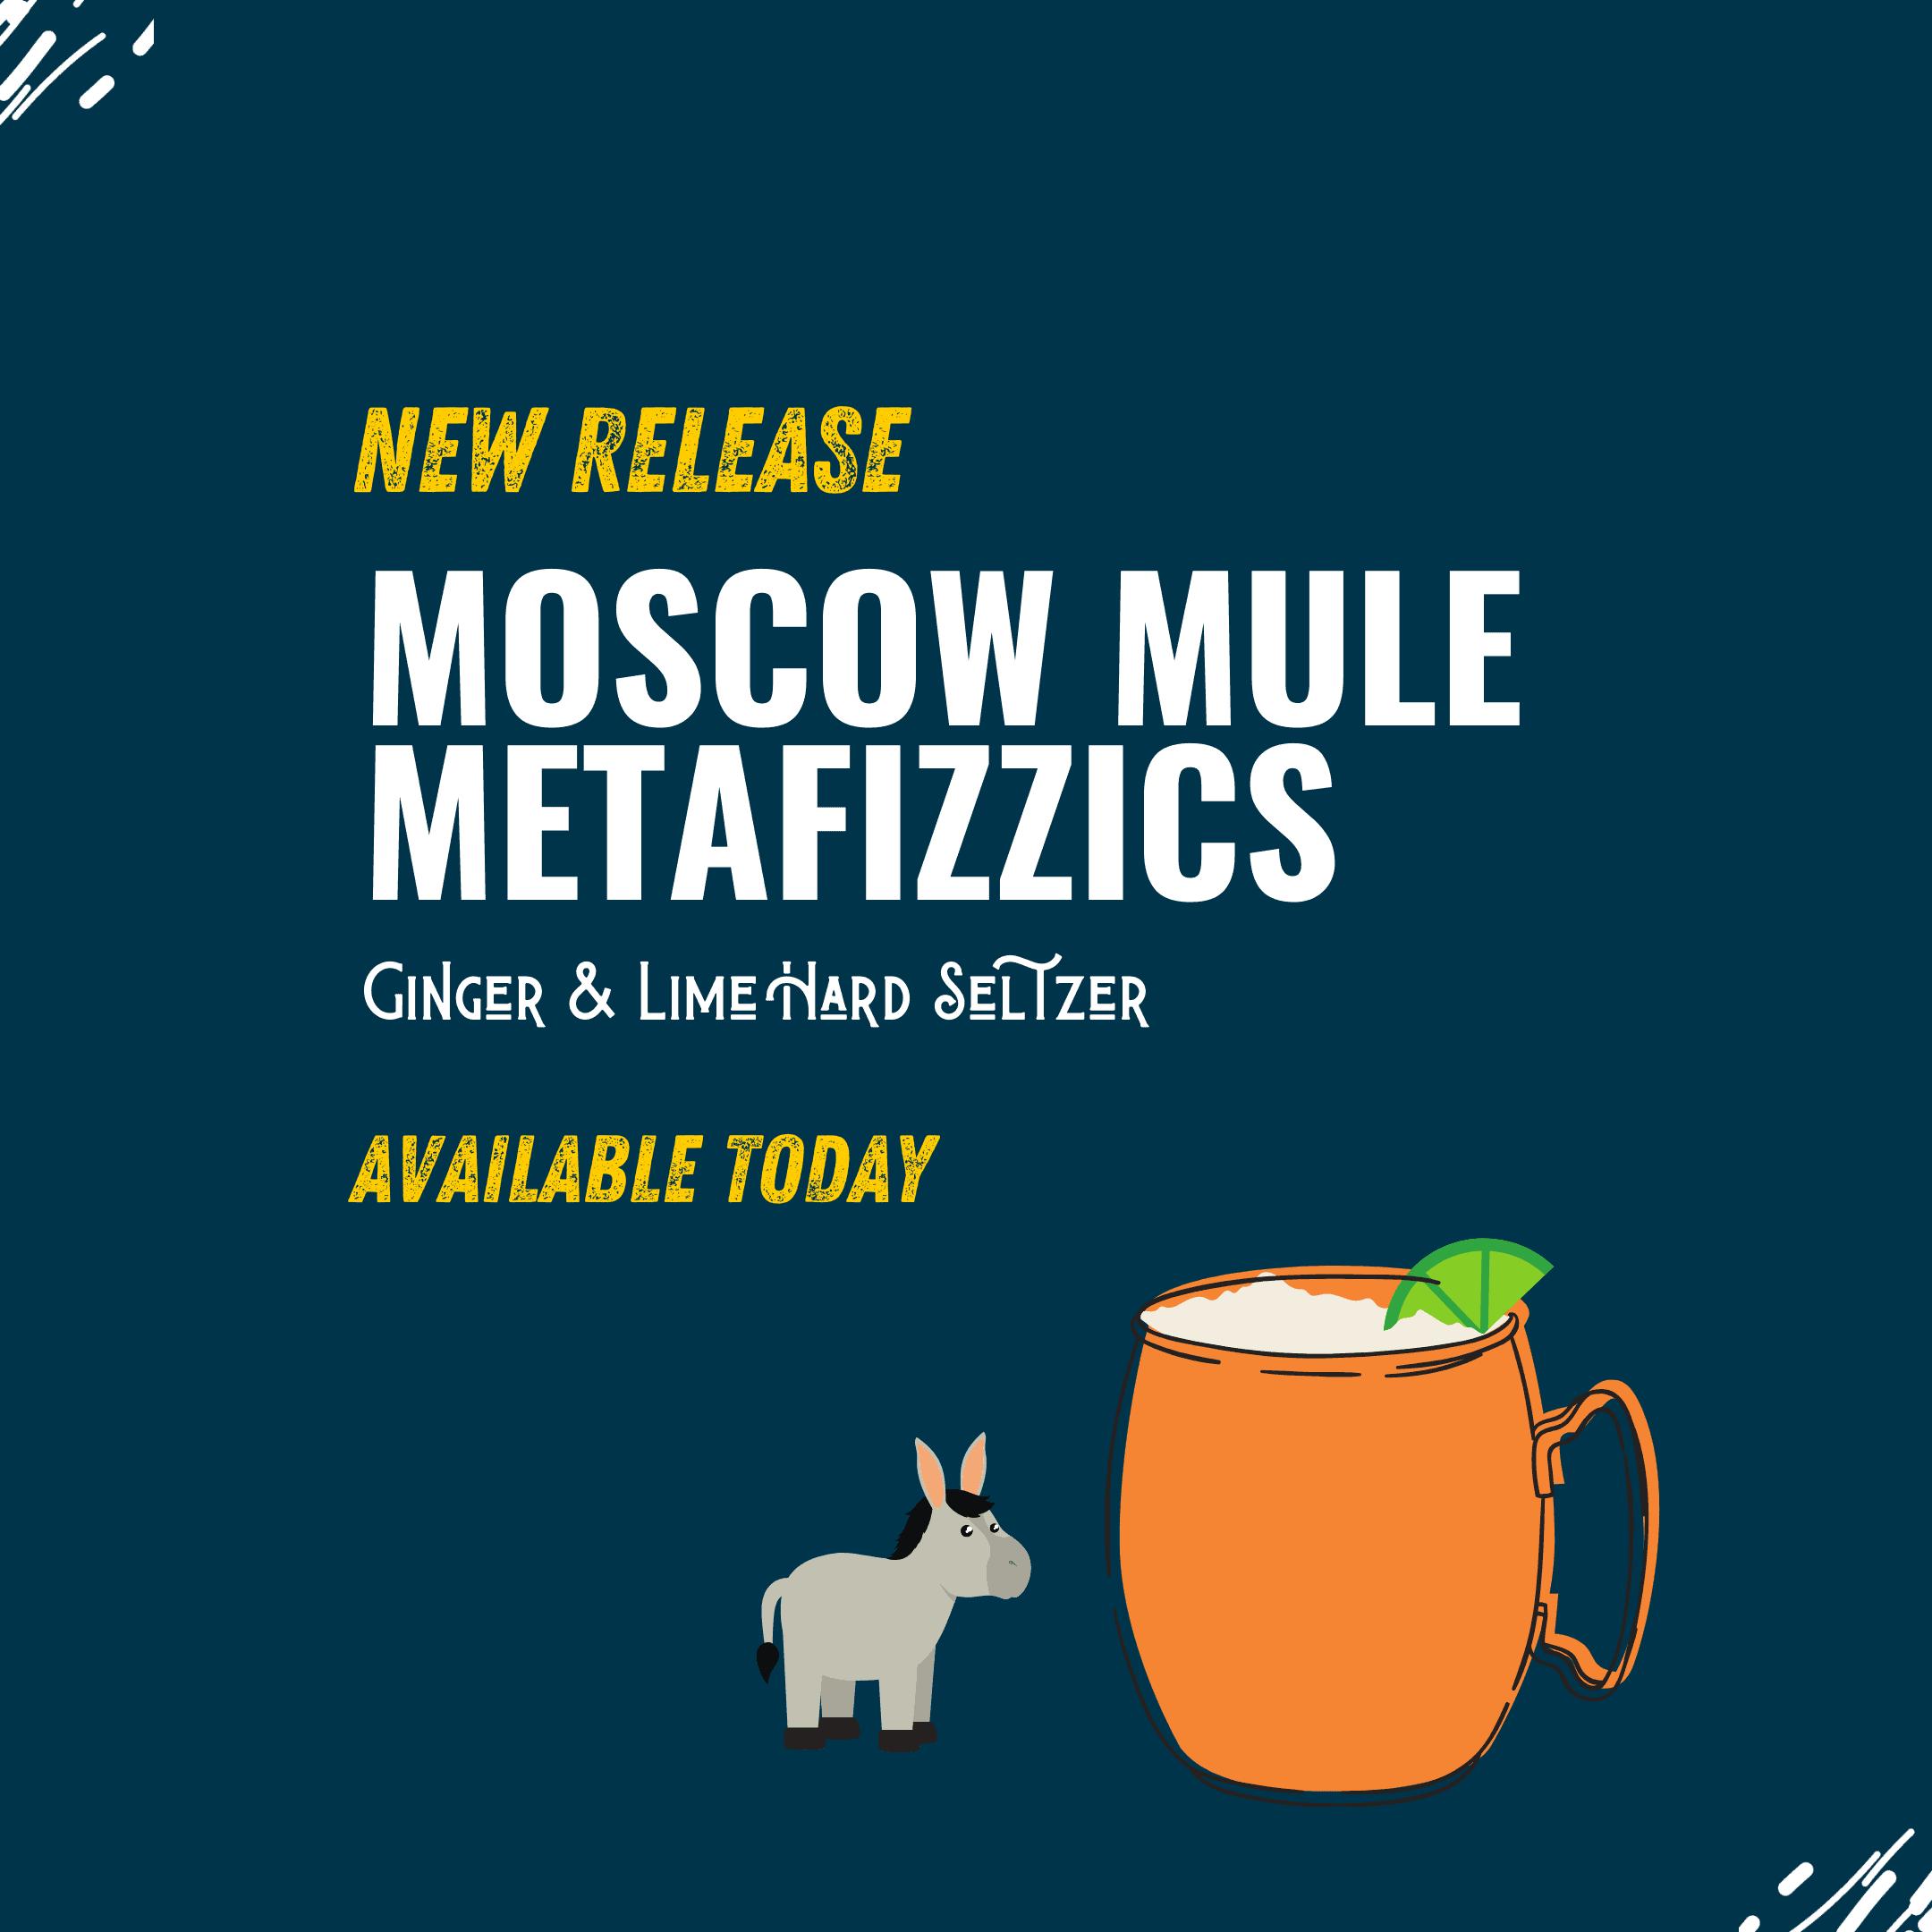 Moscow Mule Metafizzics